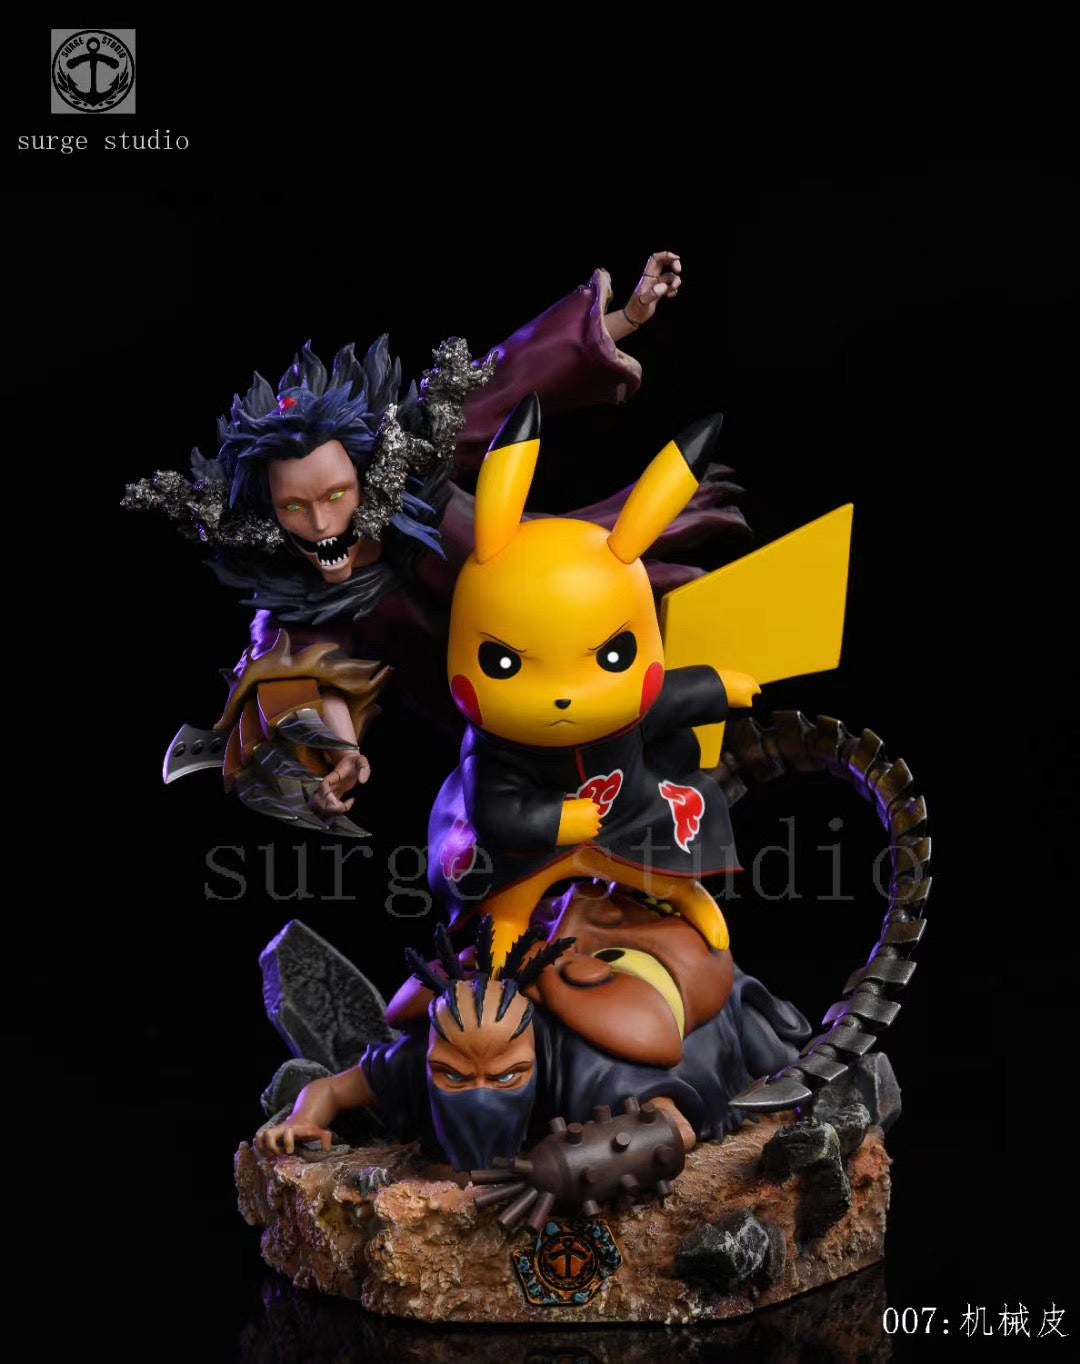 Image of [Last-Stock]Surge Studio Pikachu Cross Sasori Resin Statue